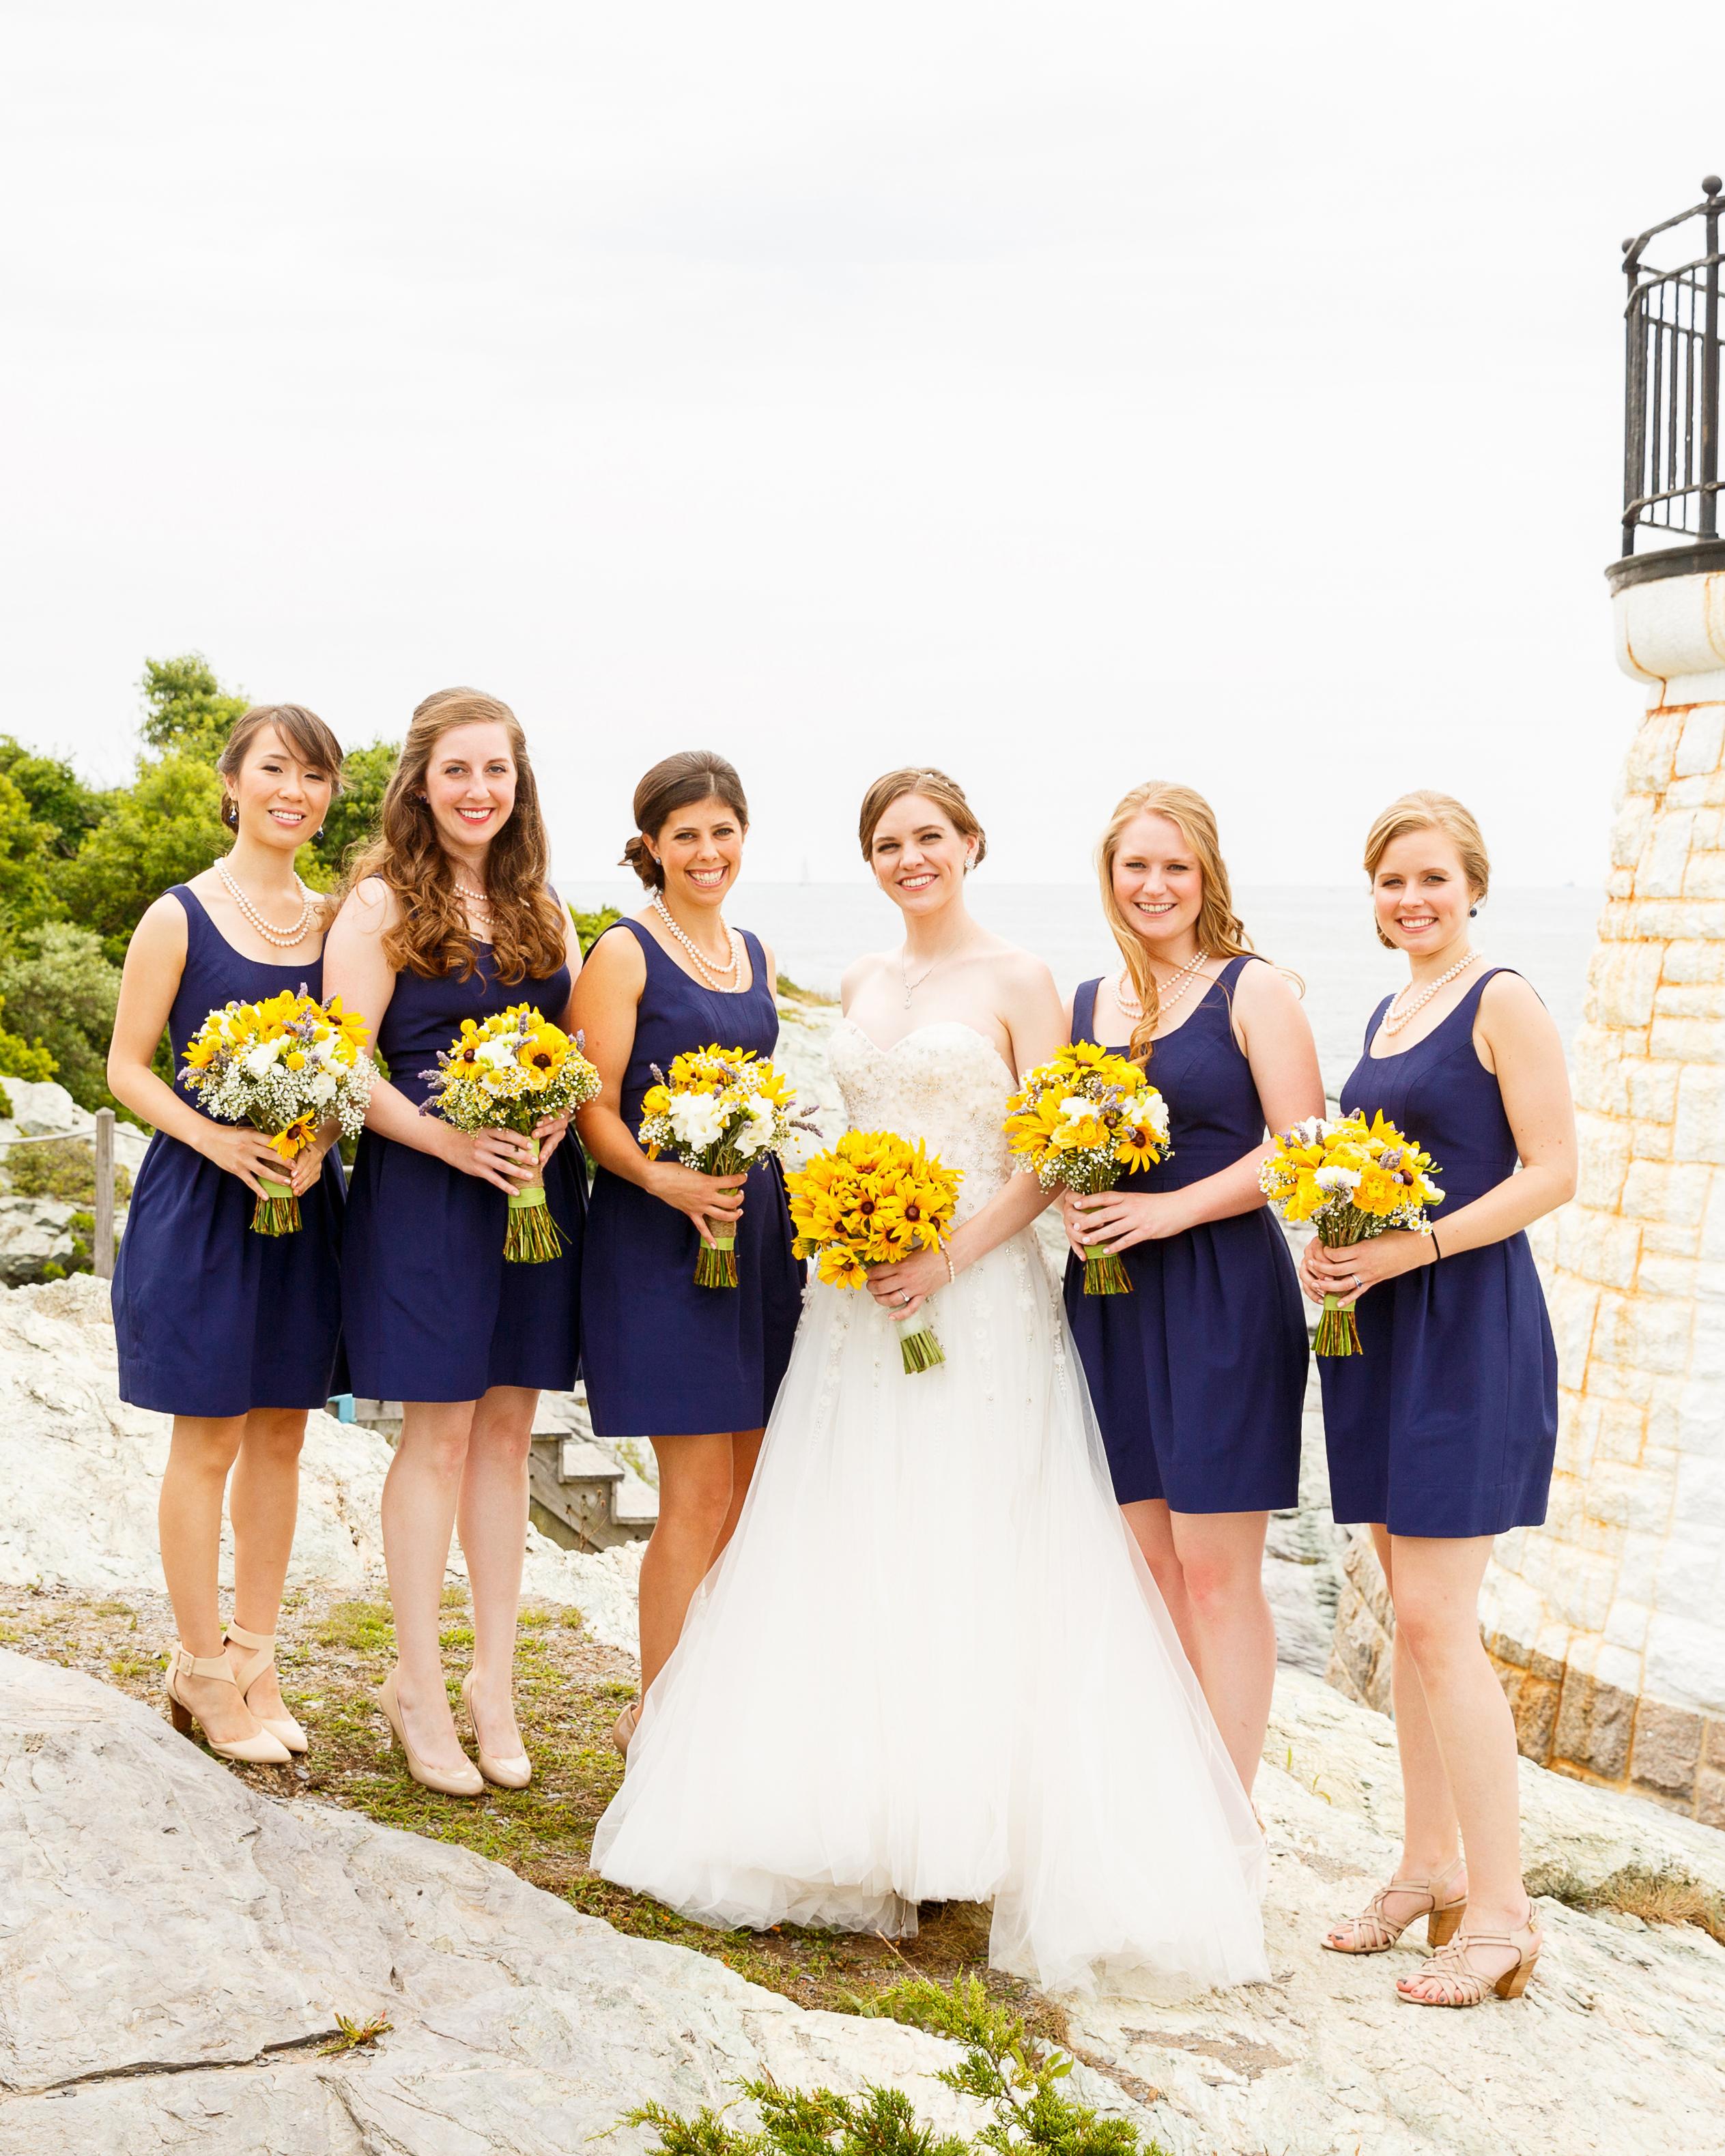 kristel-austin-wedding-bridesmaids-0469-s11860-0415.jpg